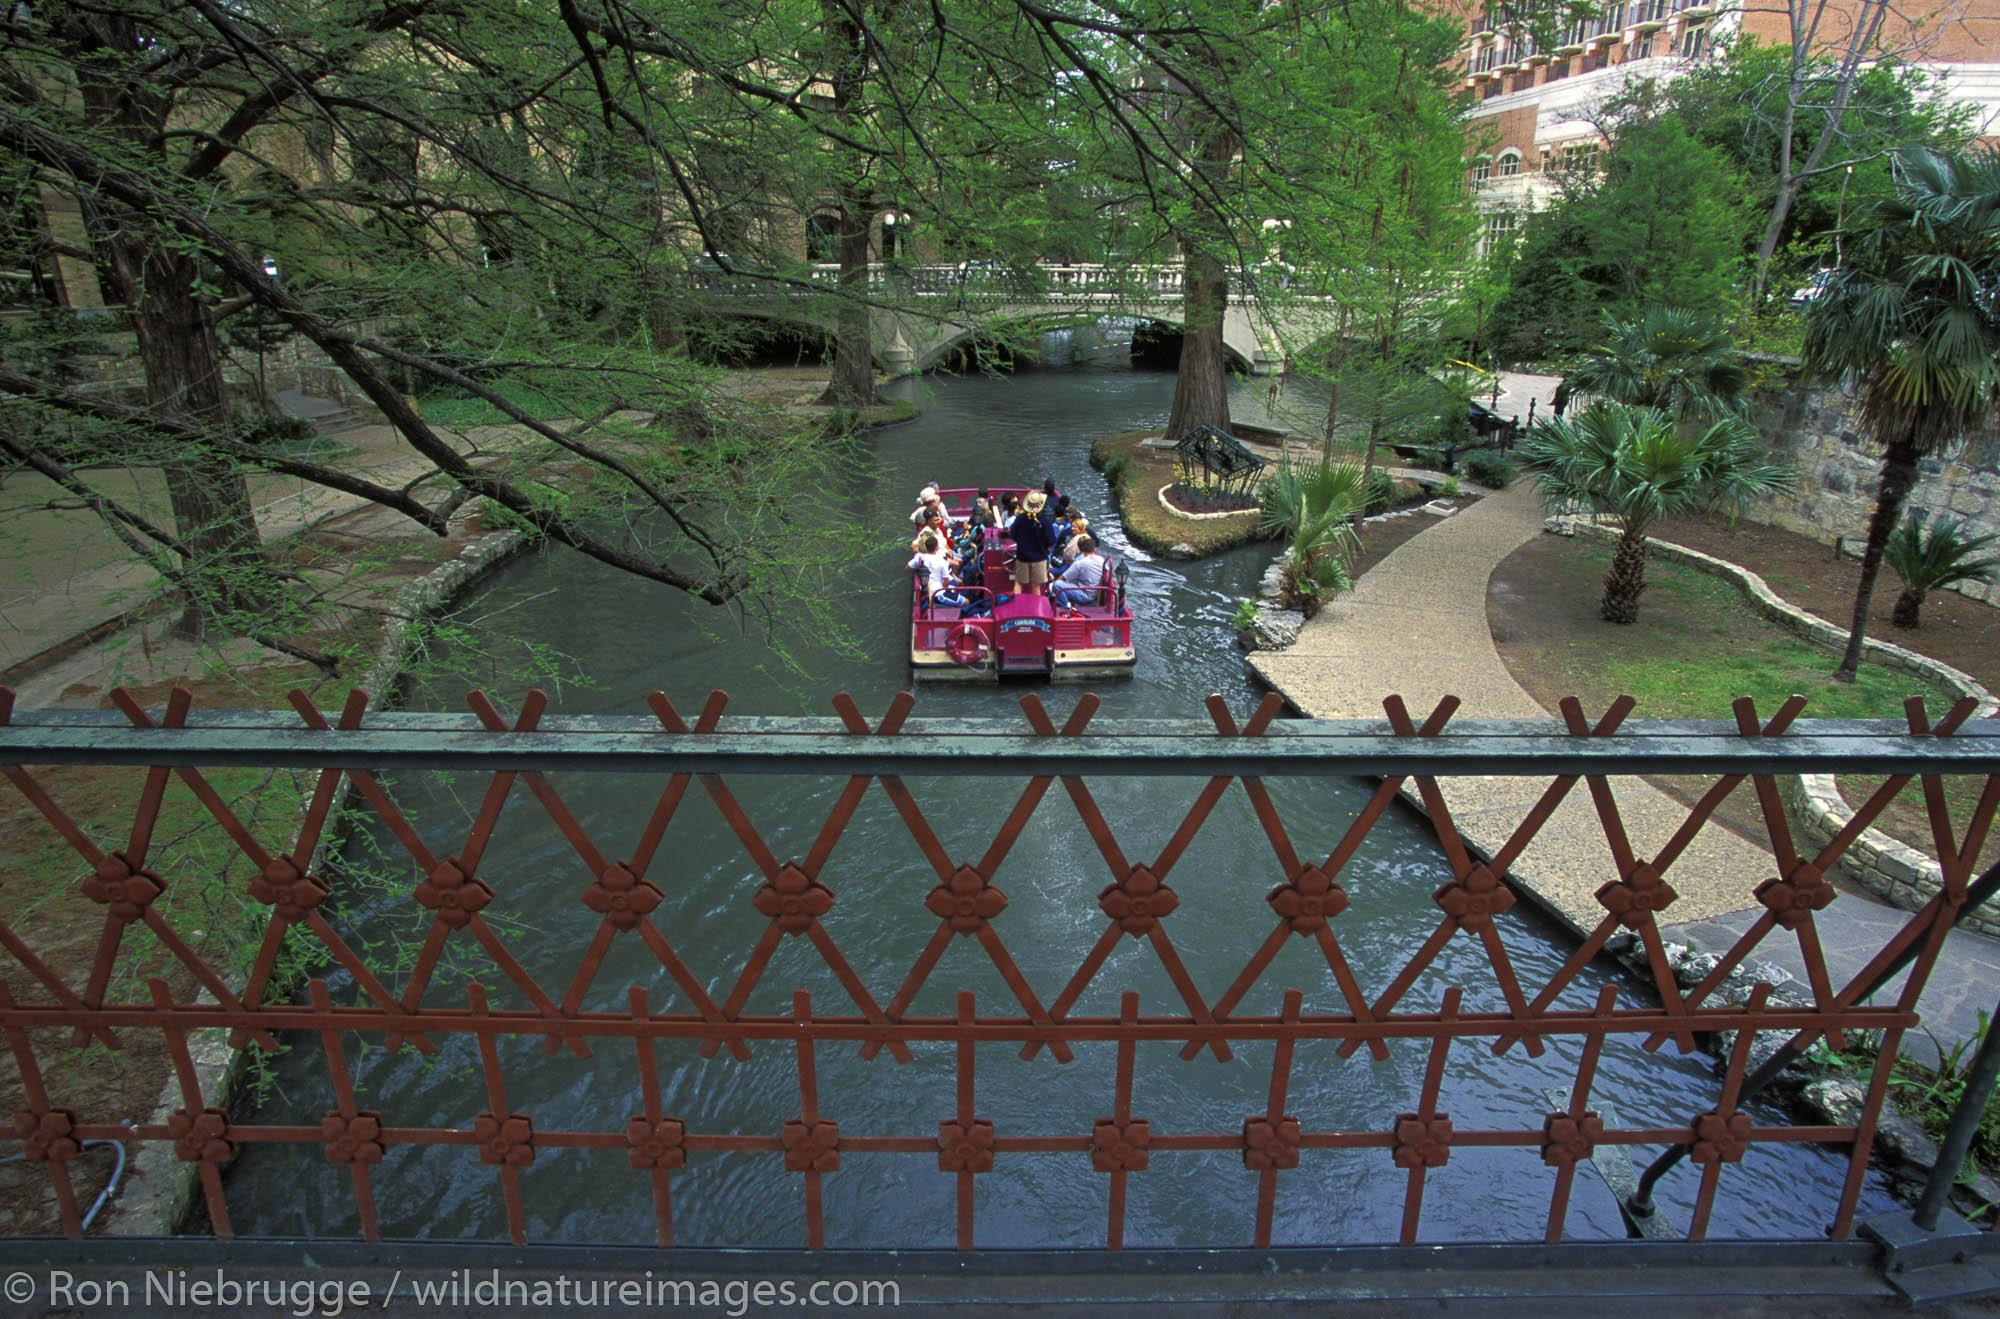 A tour boat travels under a Iron Bridge over the Riverwalk, San Antonio, Texas.